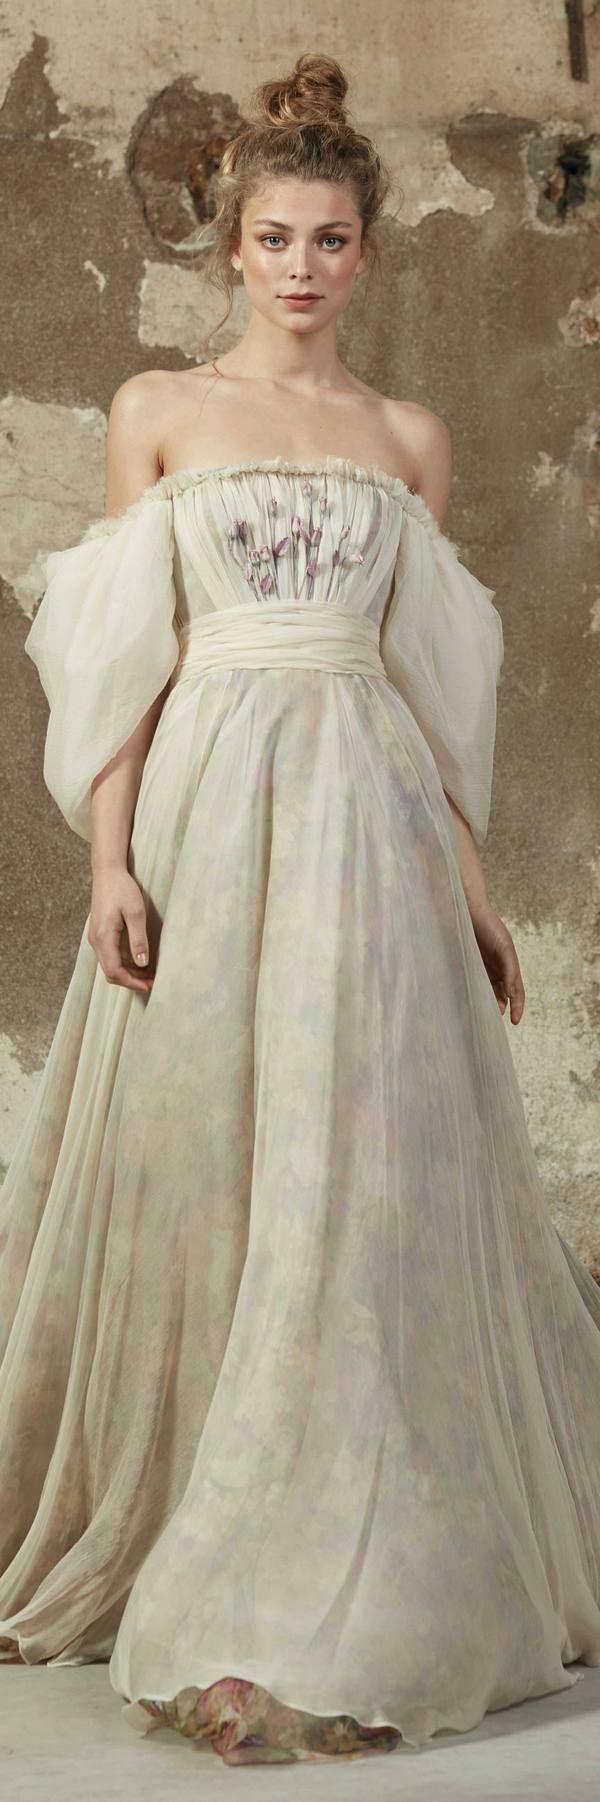 Rara avis wedding dresses names gowns pinterest wedding